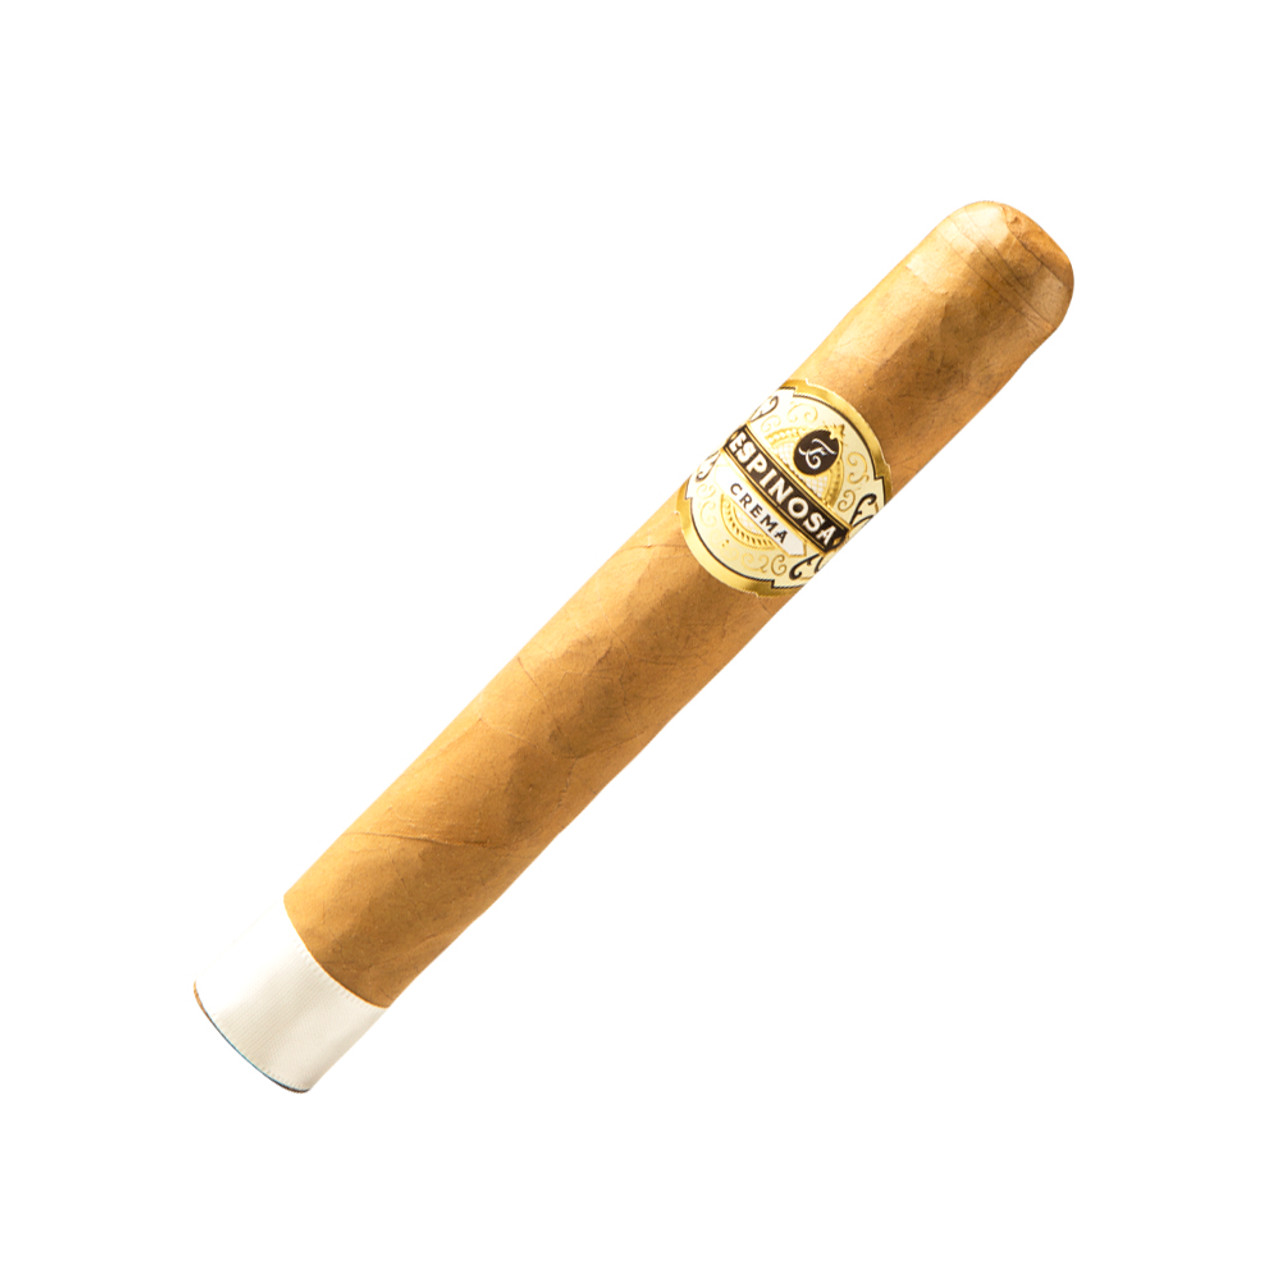 Espinosa Crema No. 5 Toro Grande Cigars - 6 x 56 (Box of 20)